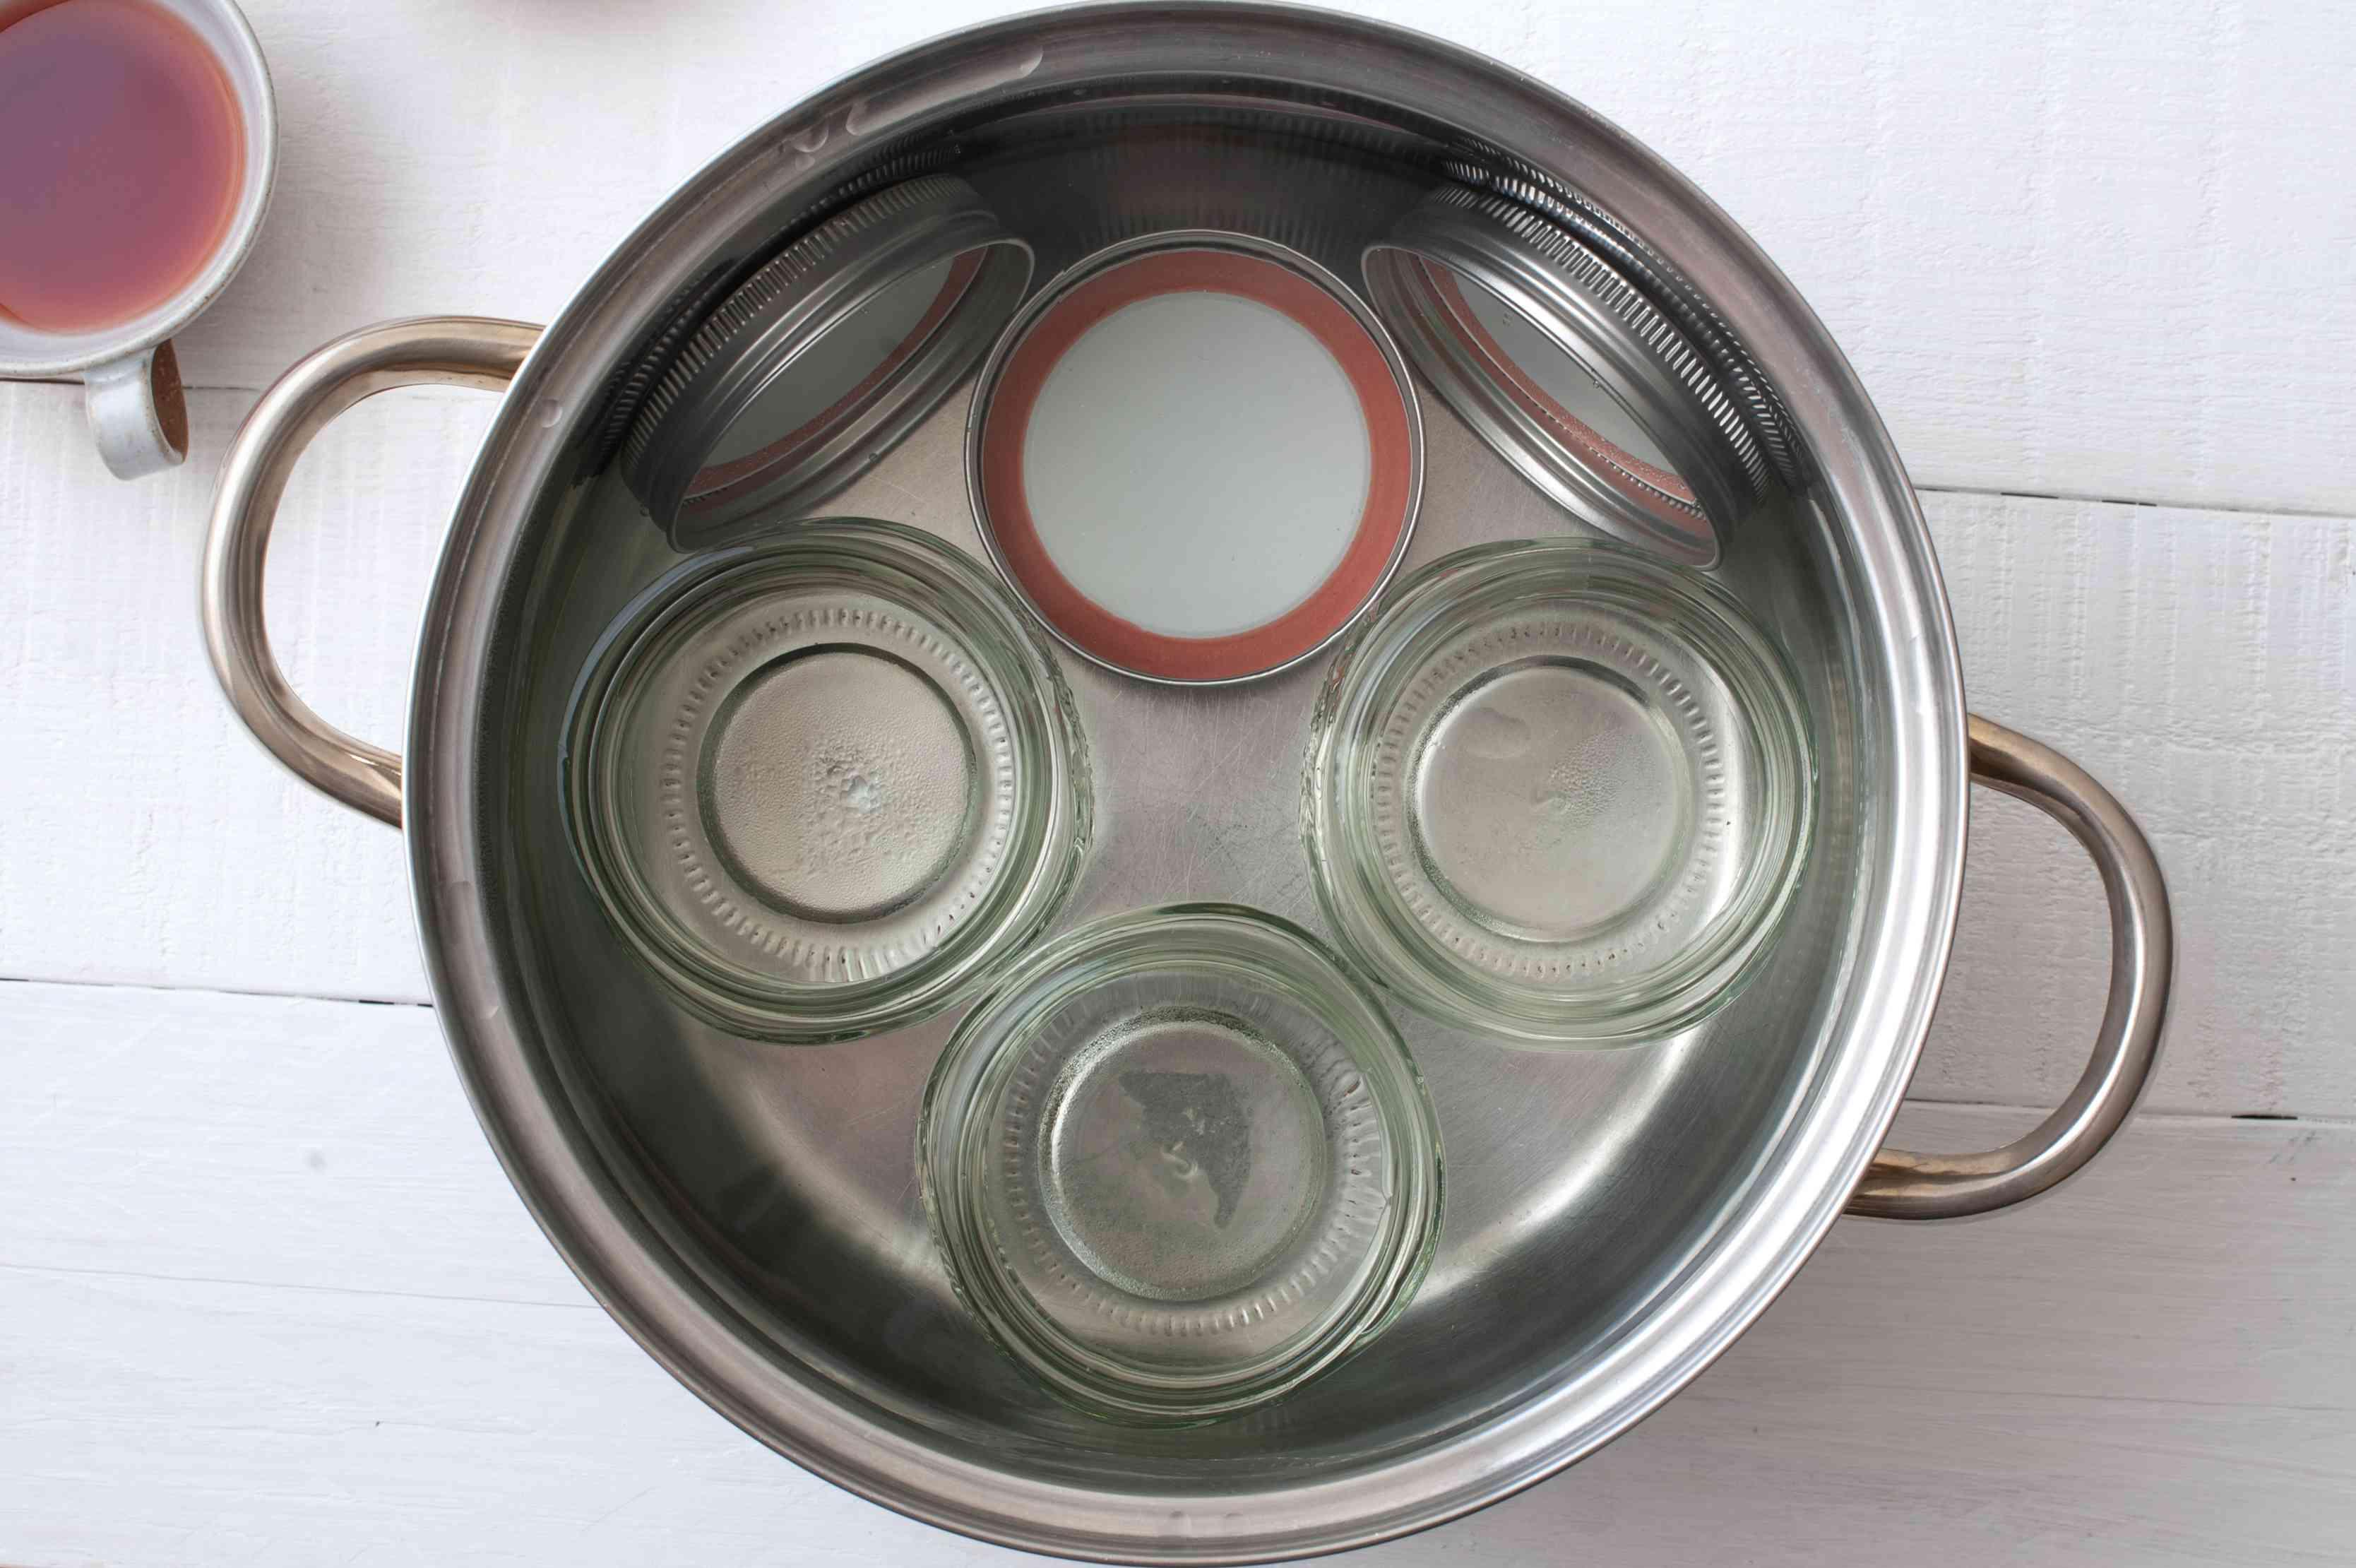 Sterilize jars